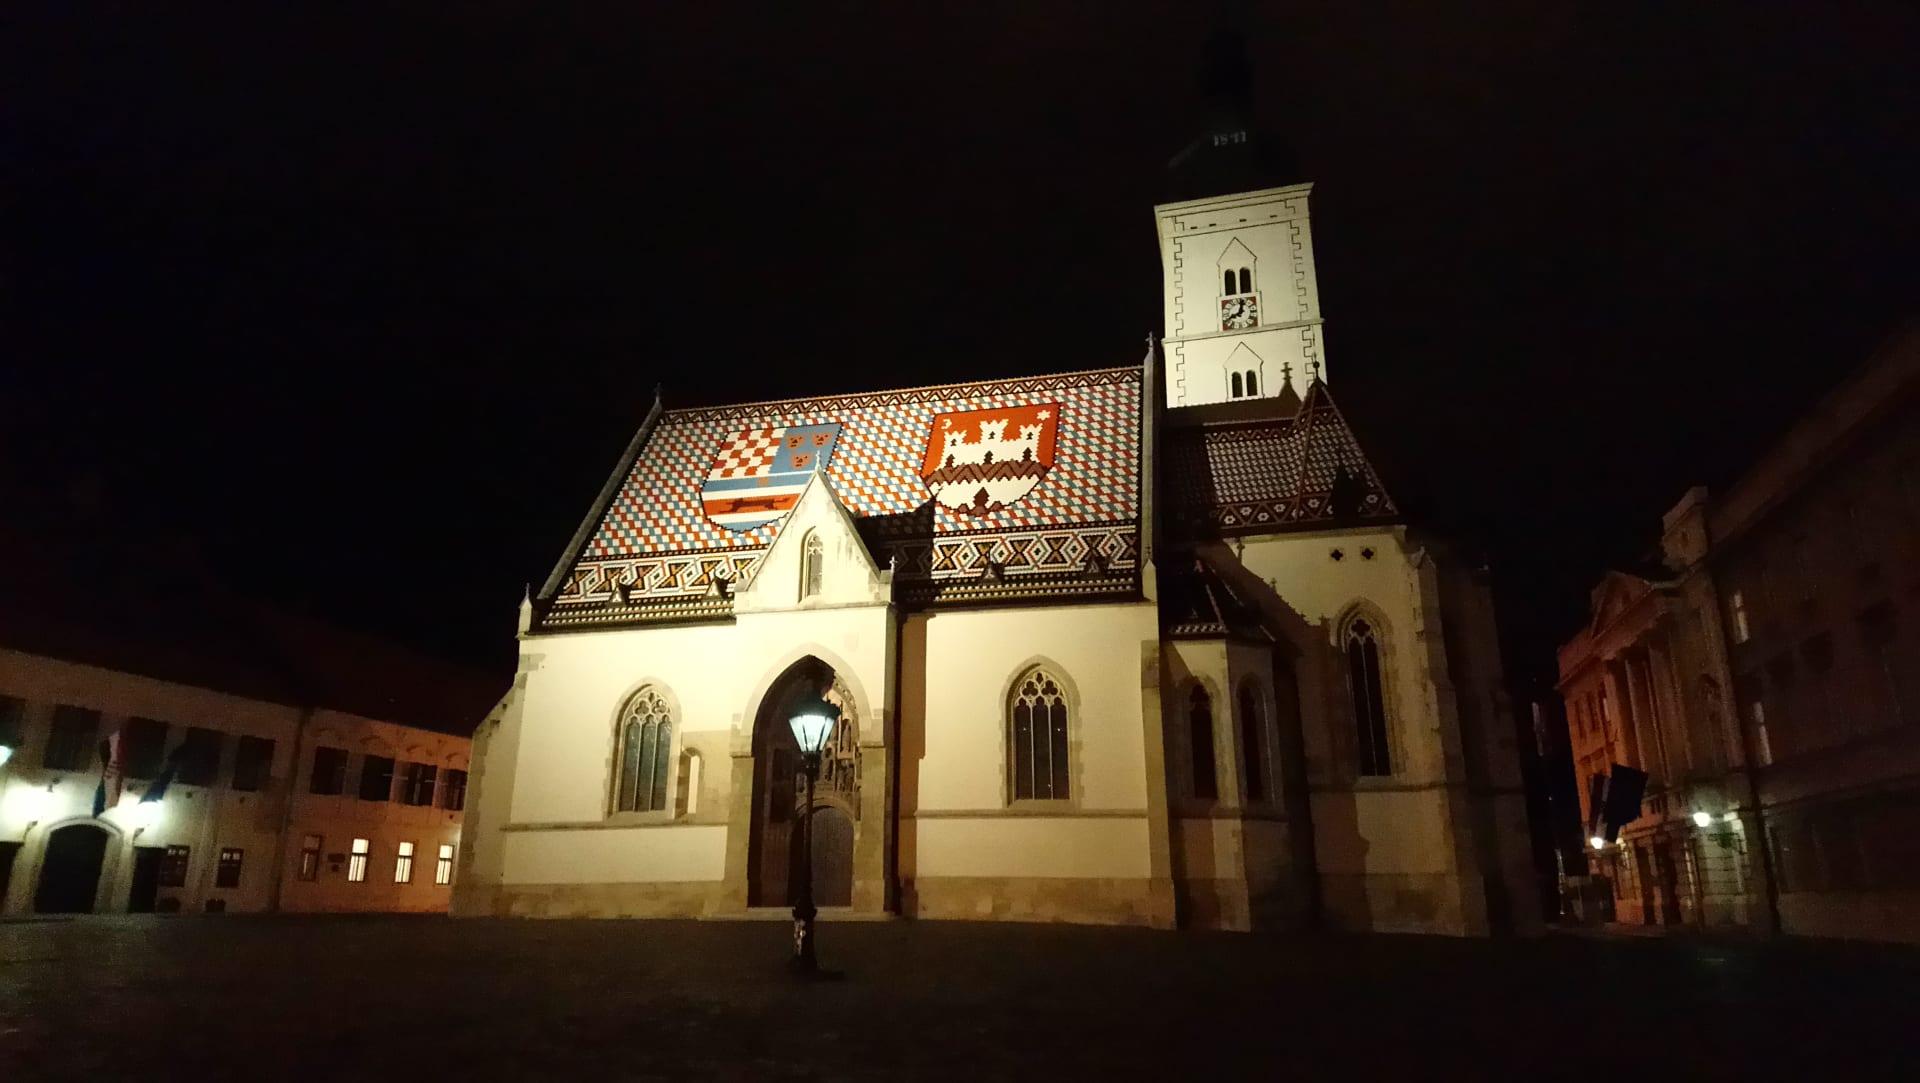 Kirche des hl. Markus (Foto: Dana Jungbluth)